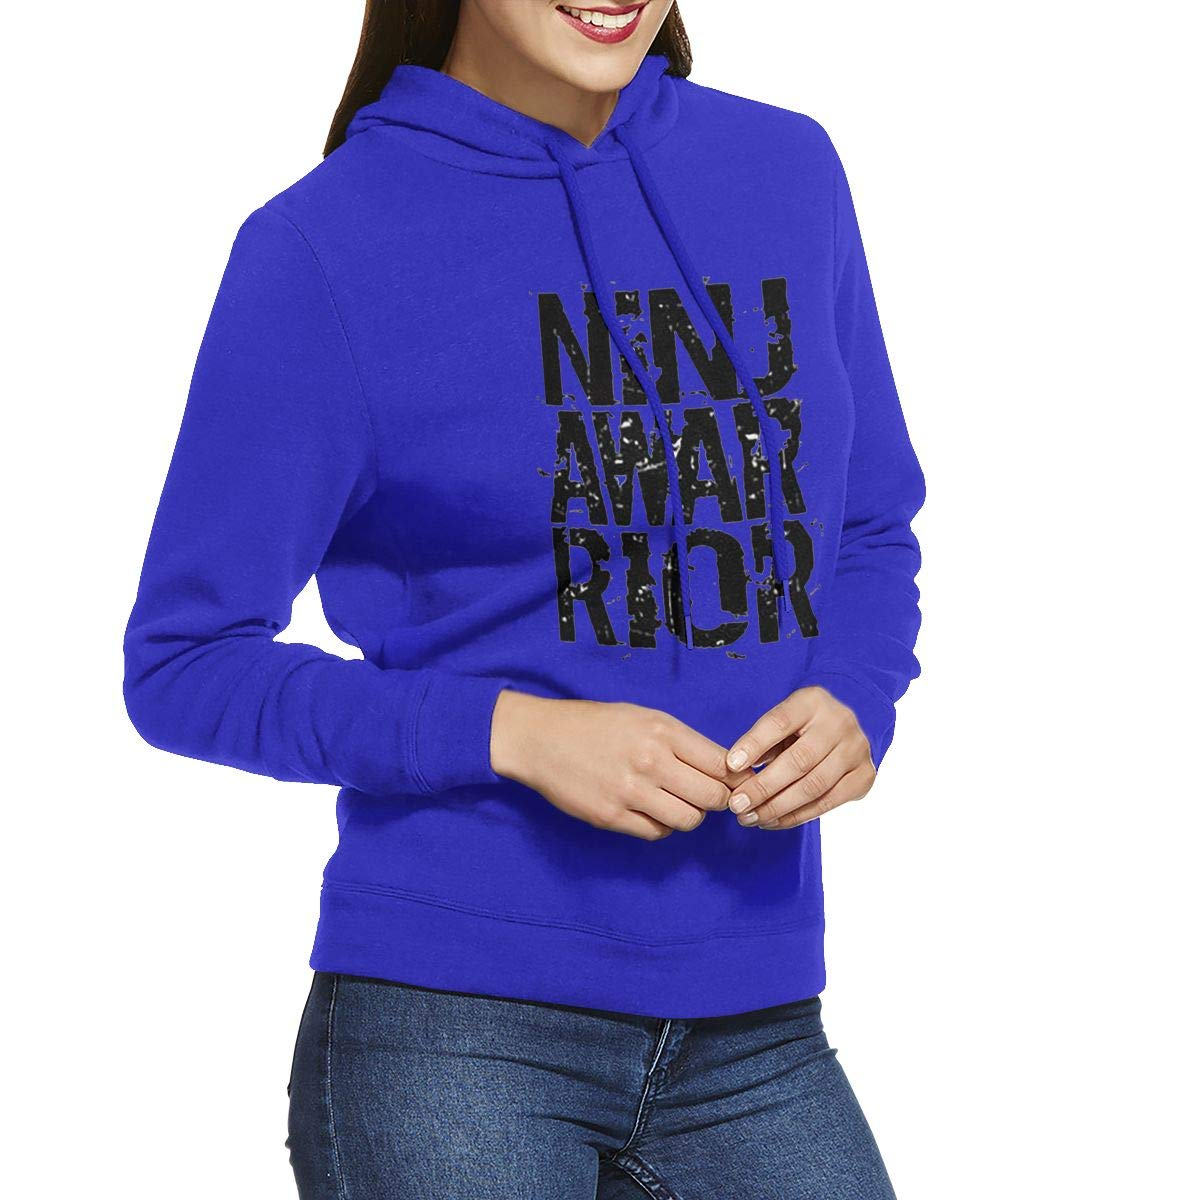 Womens Hoodies Ninja Warrior Inspiring Girl Casual Hooded ...